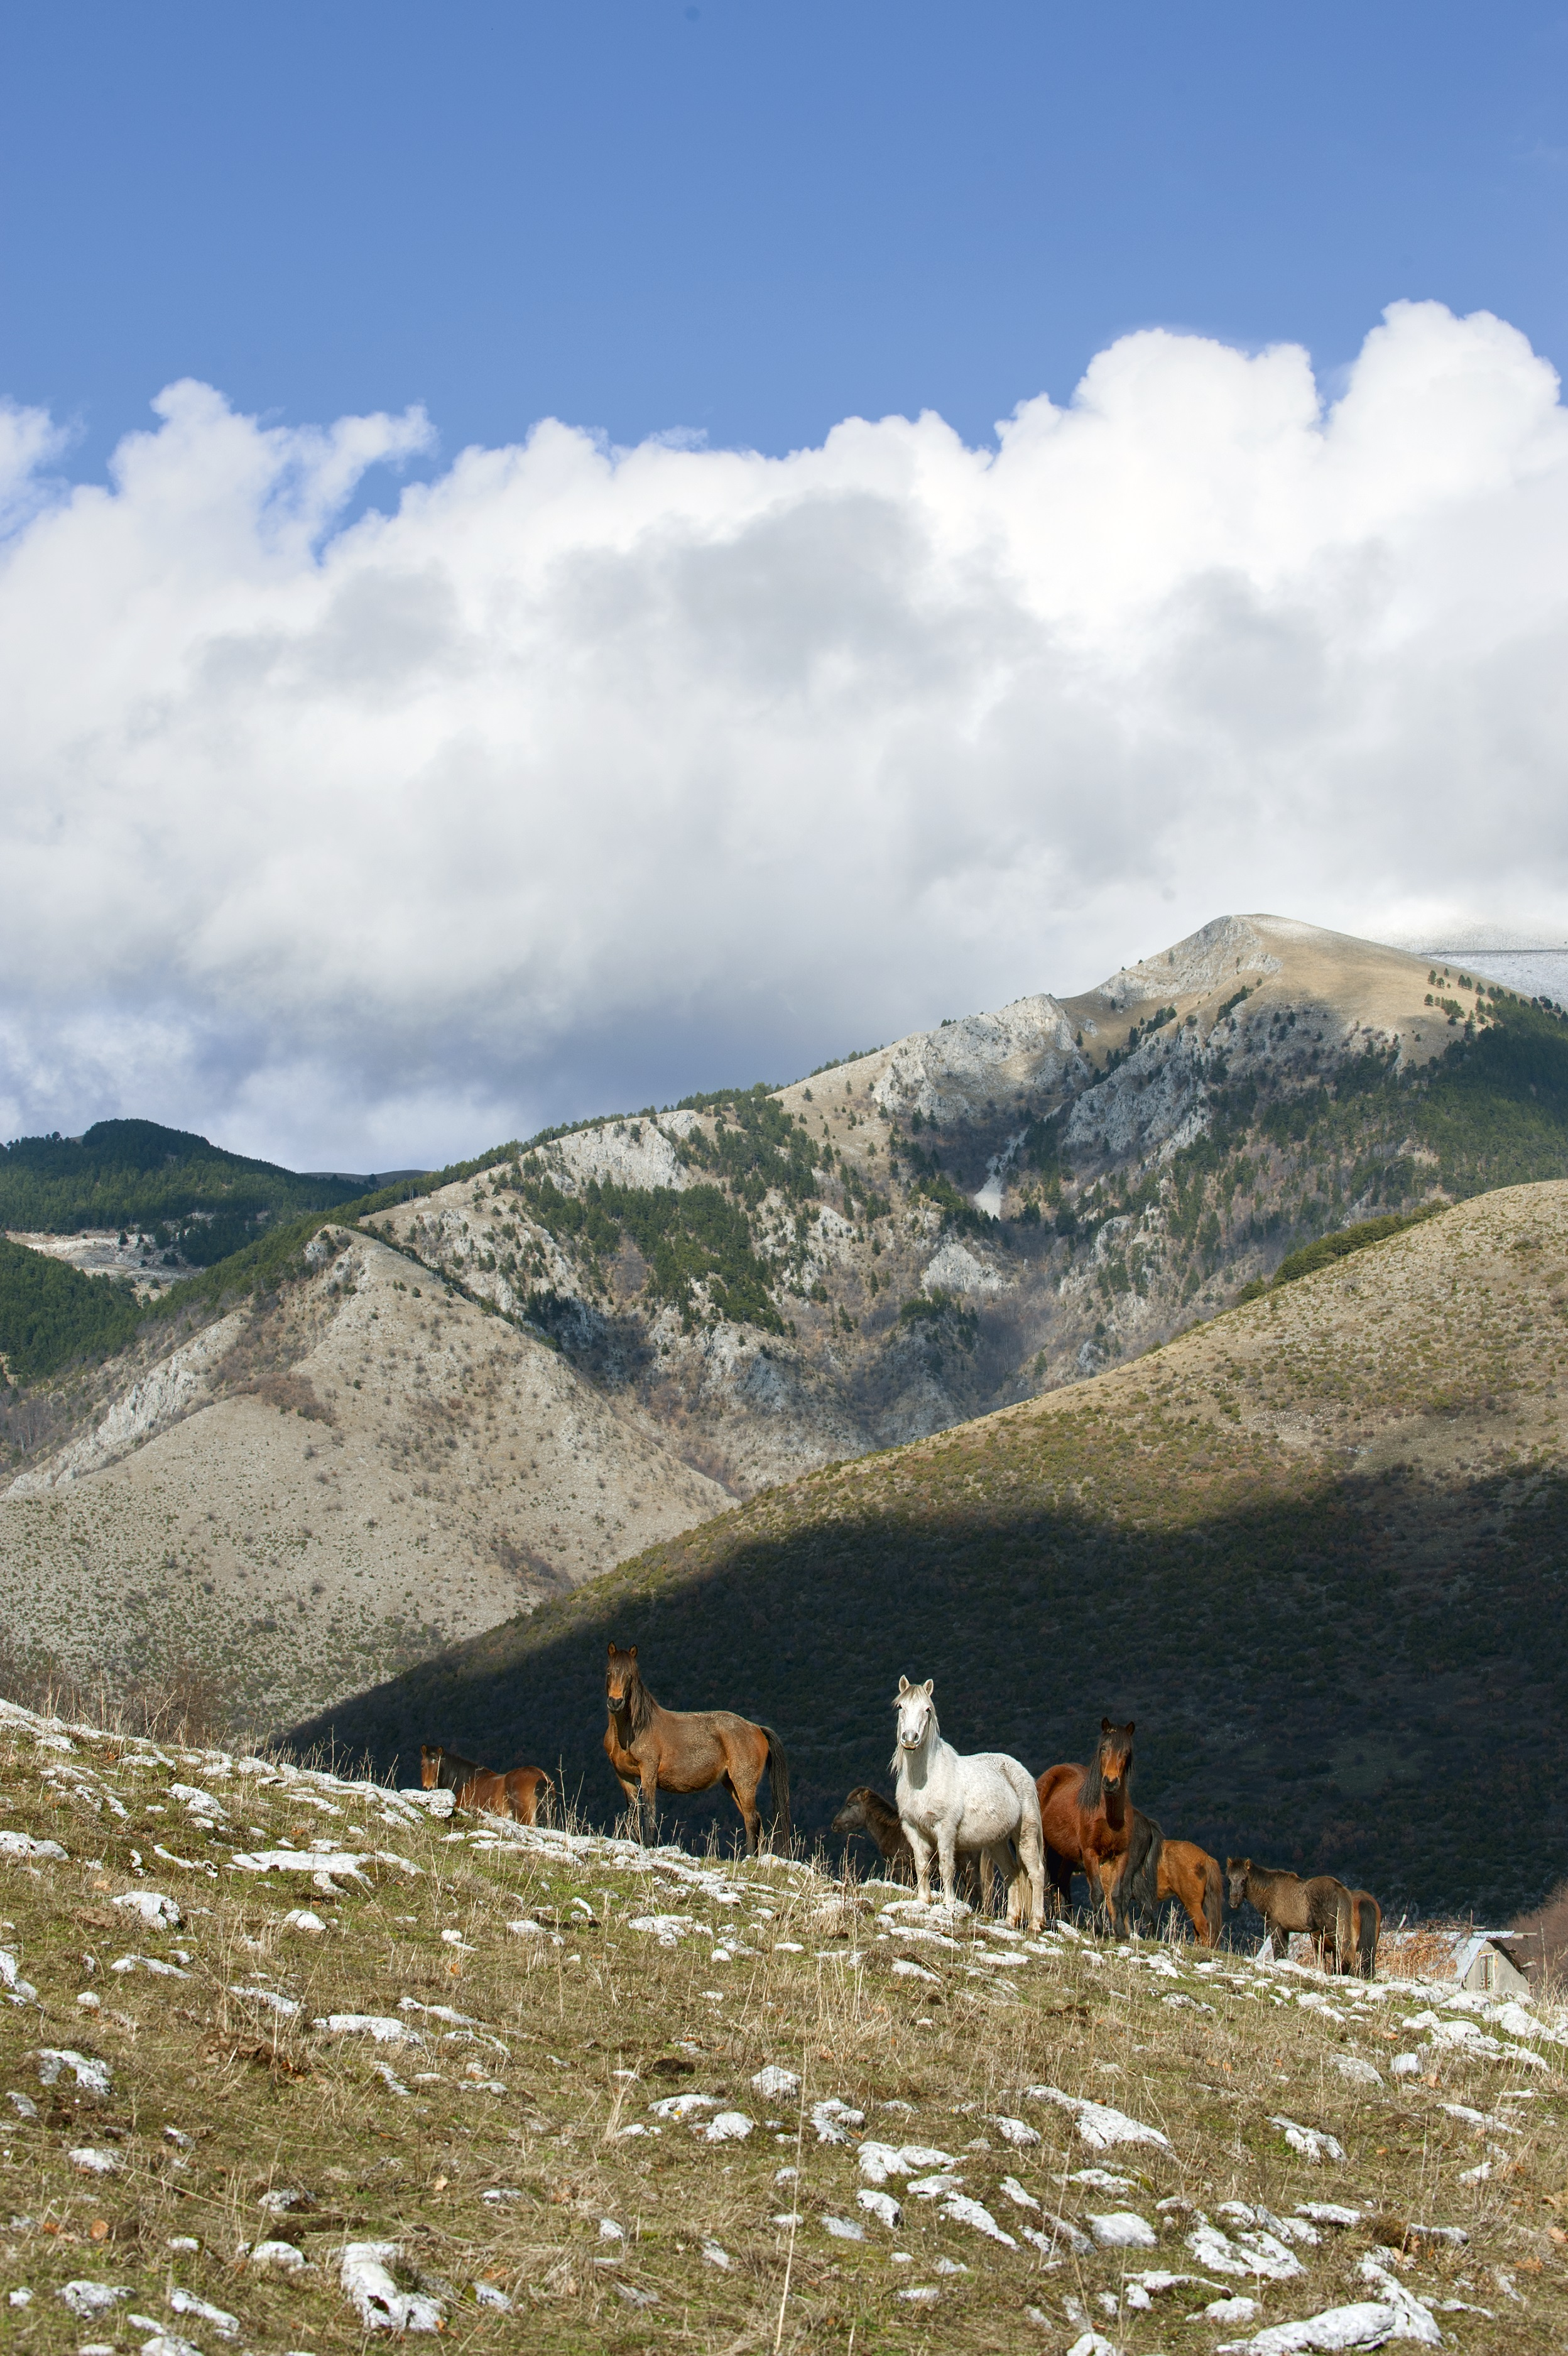 fa155a1eca7 «Άγρια» άλογα στην περιοχή του οροπεδίου Σίτνα στο Φαλακρό. Πριν από  χρόνια, ένας μερακλής τσέλιγκας του Φαλακρού απελευθέρωσε συνειδητά τα άλογα  του ...